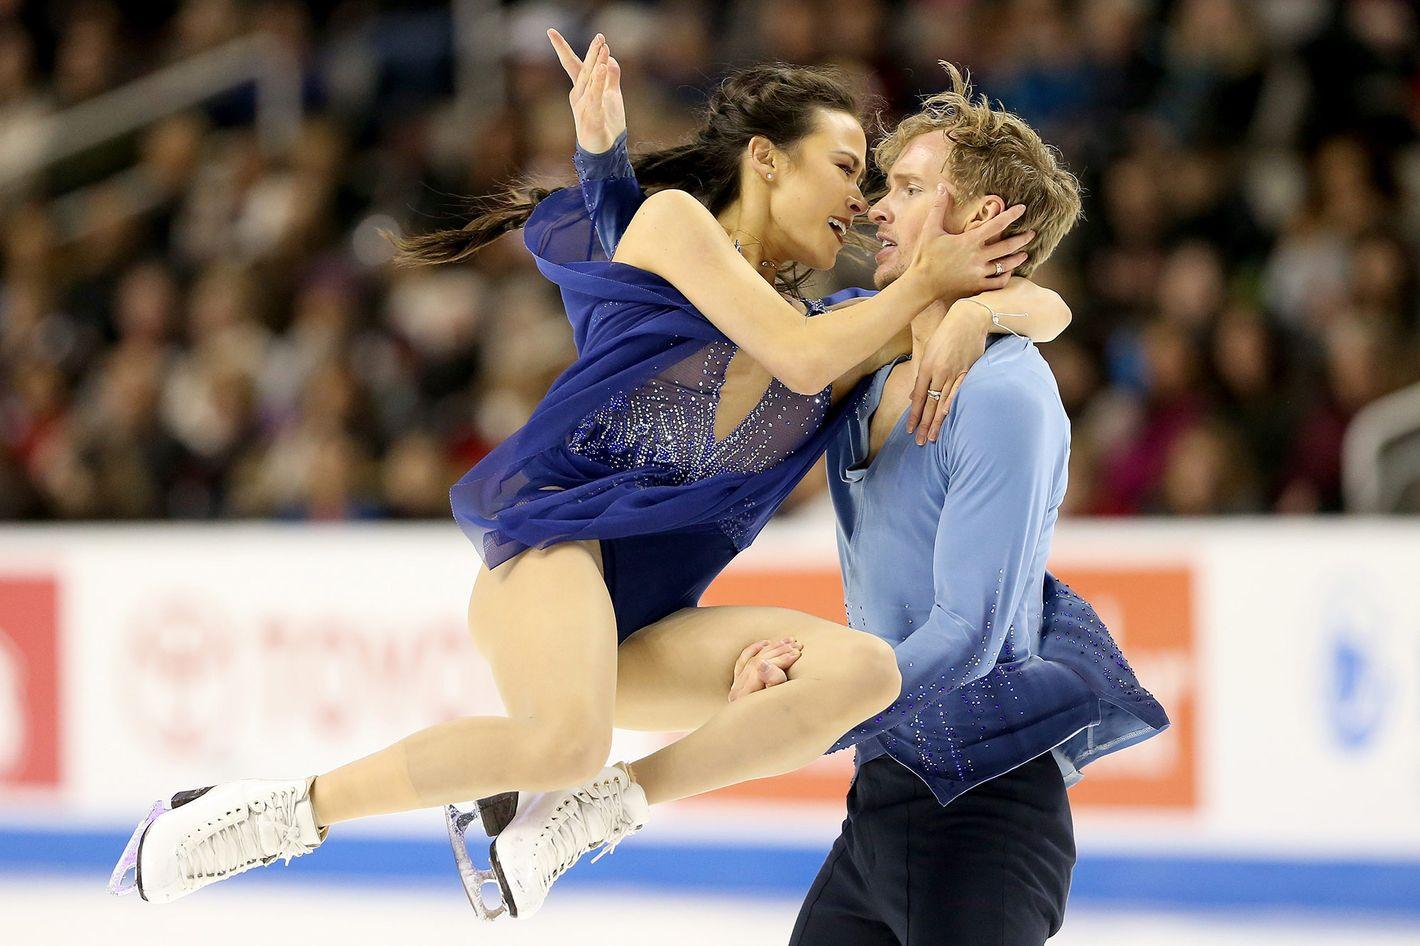 us ice dancing team dating